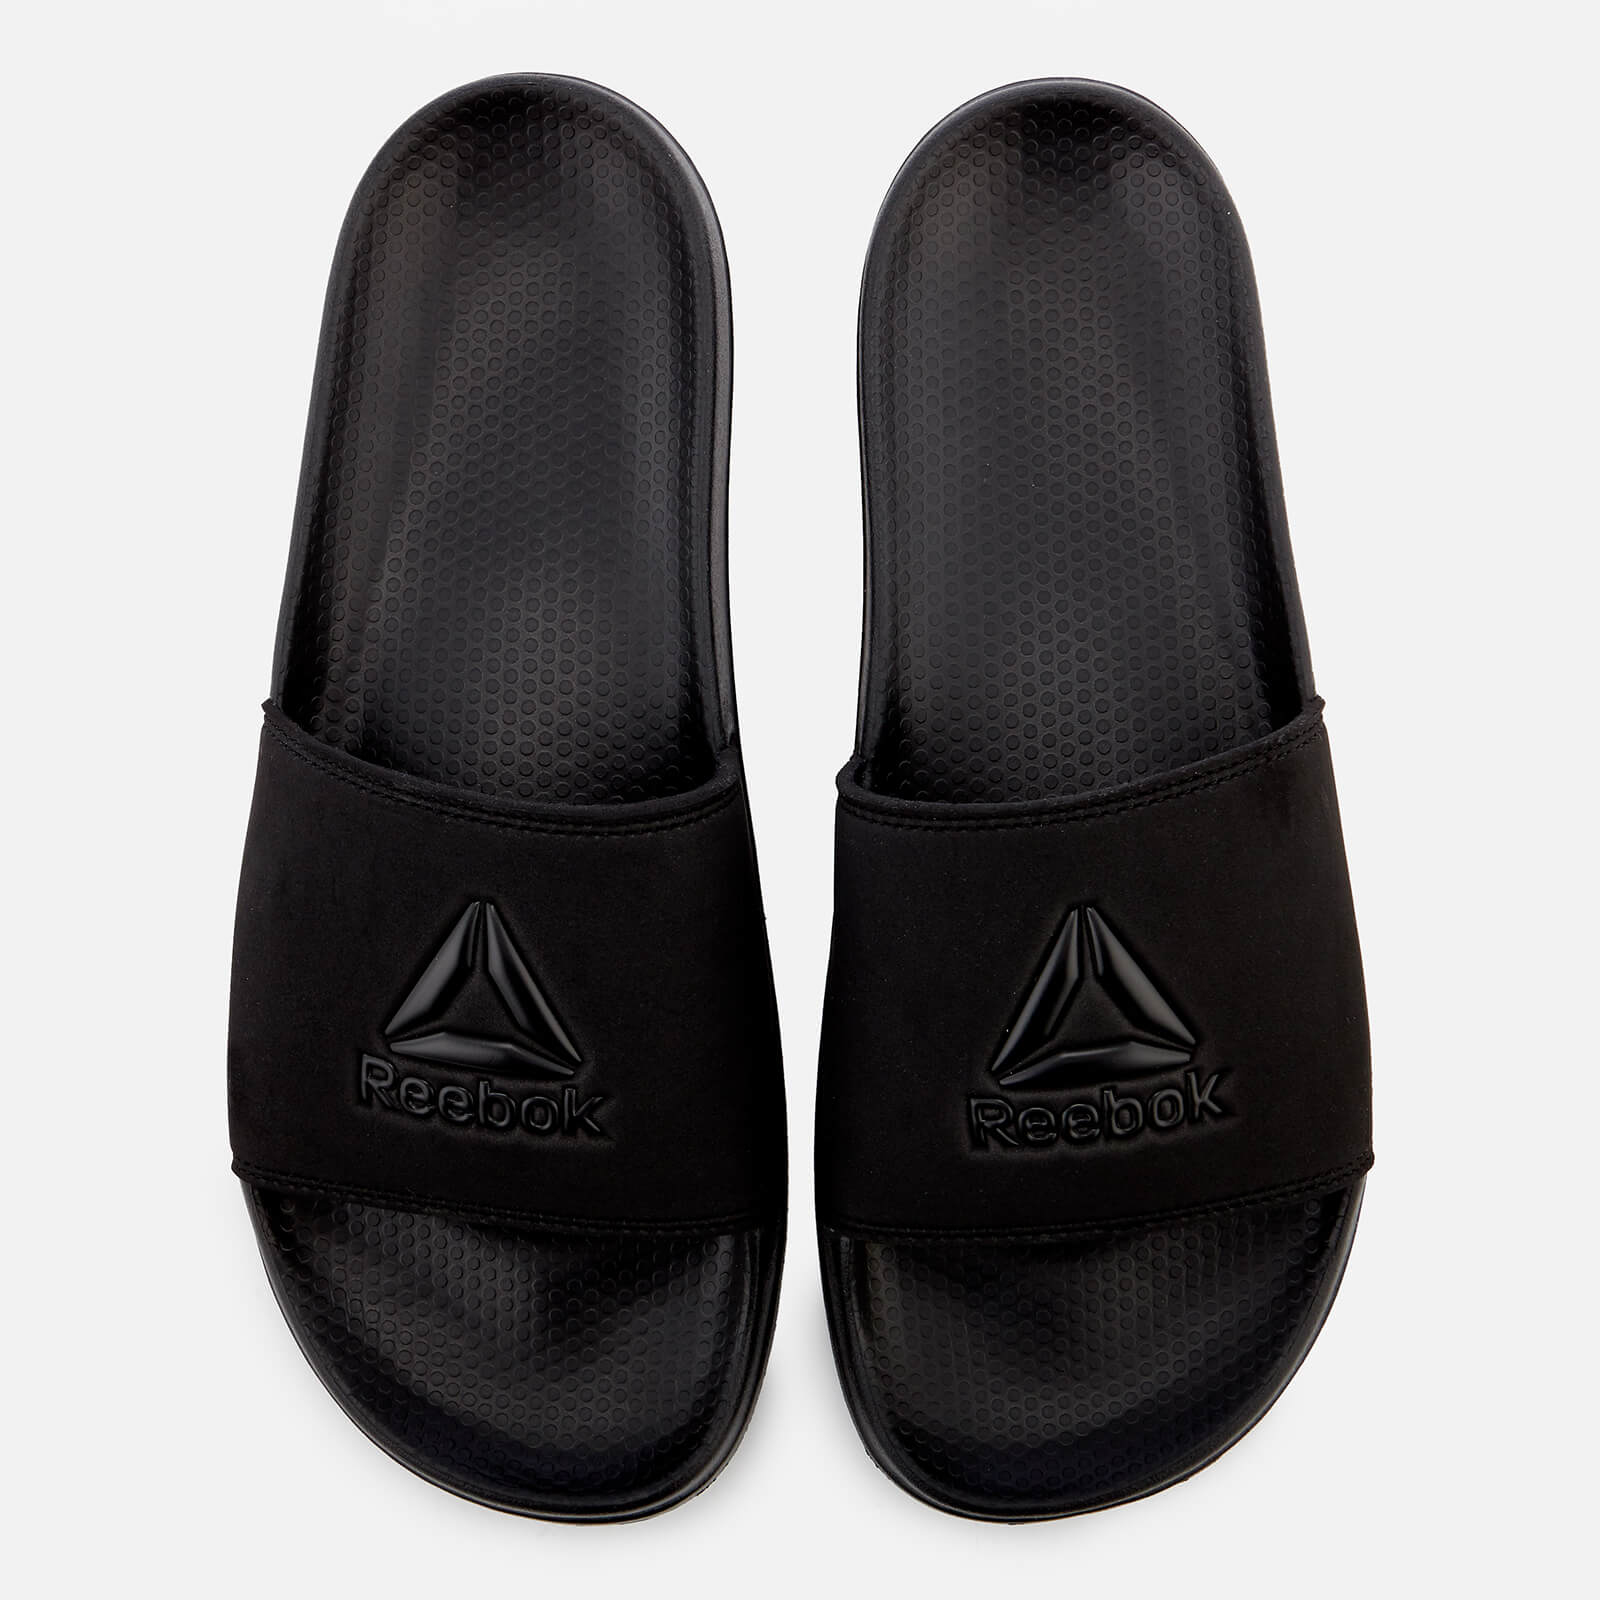 reebok slide sandals Online Shopping